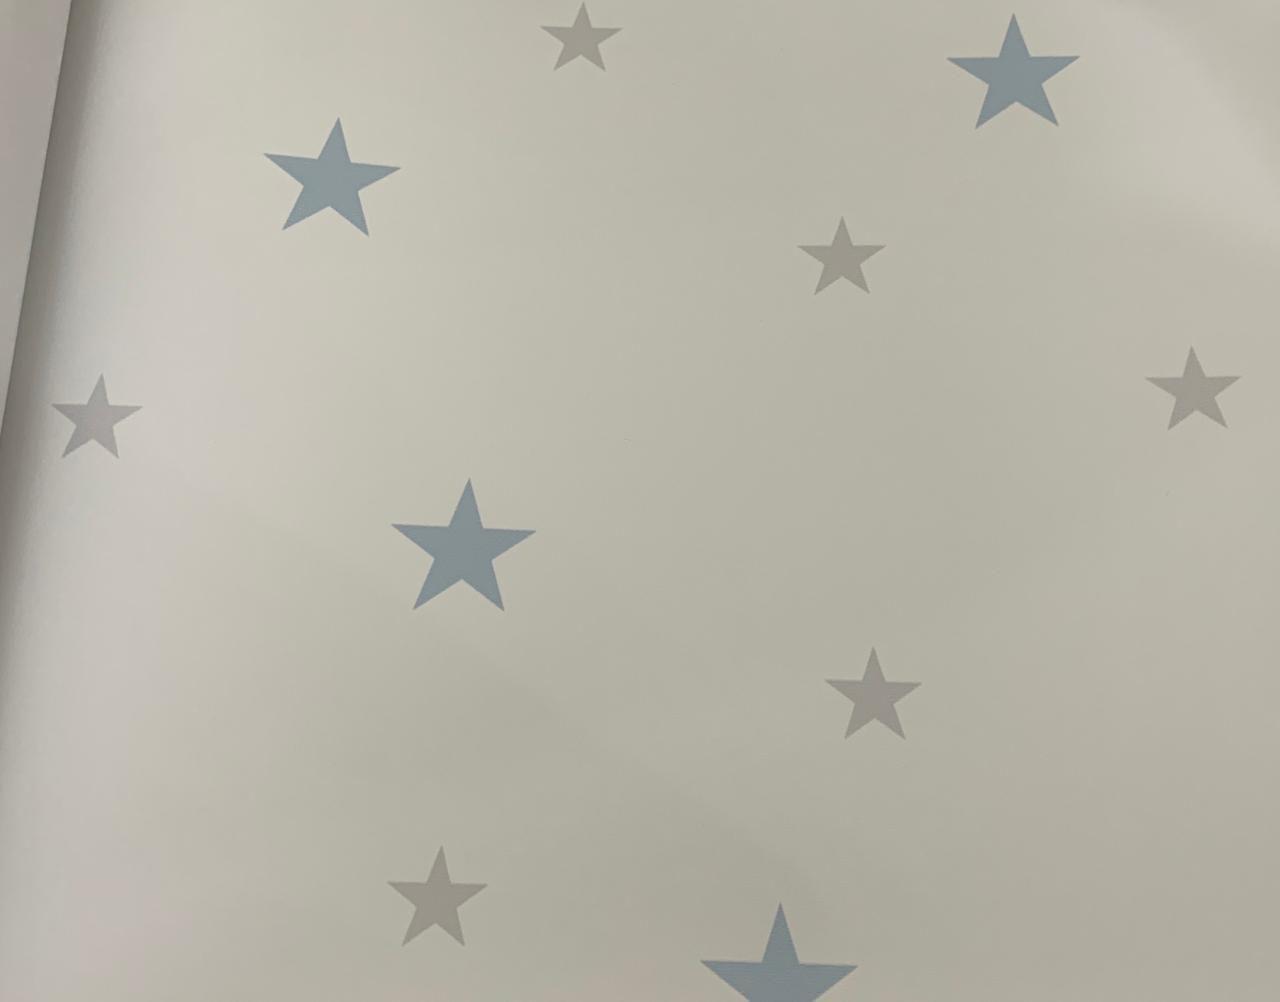 Papel de Parede Estrelinha Azul e Cinza